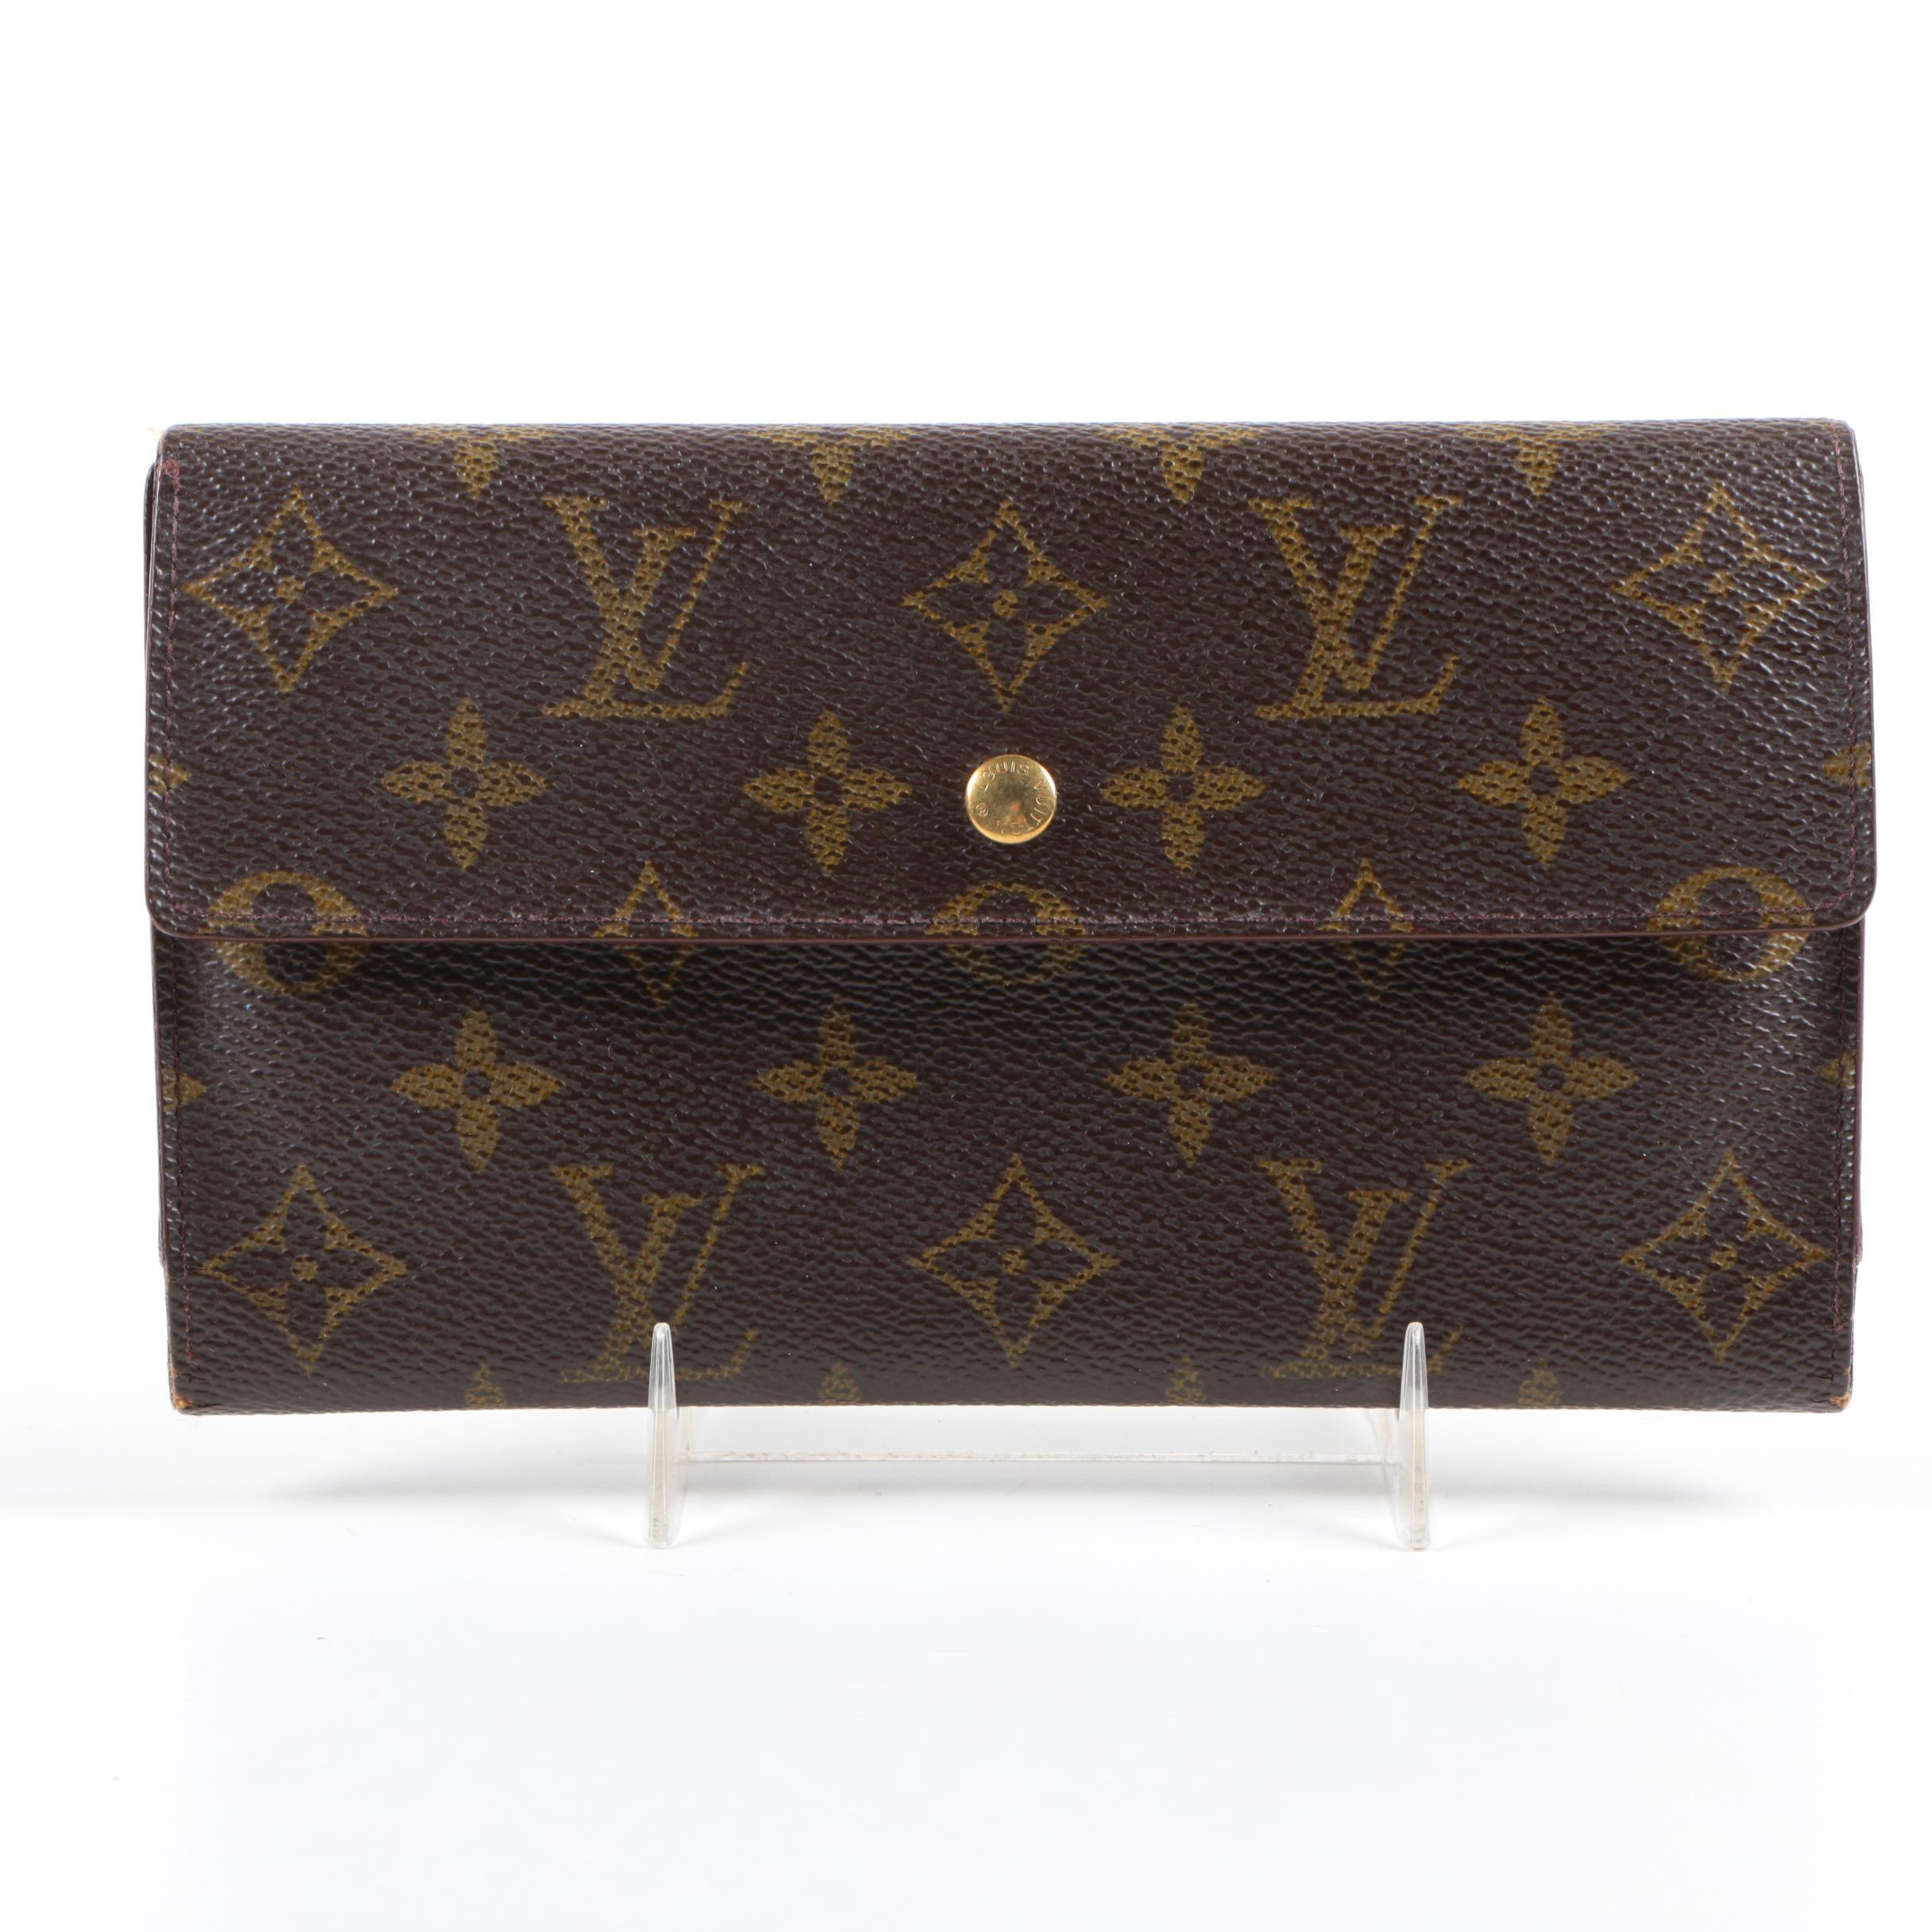 Louis Vuitton Porte-Tresor International Wallet